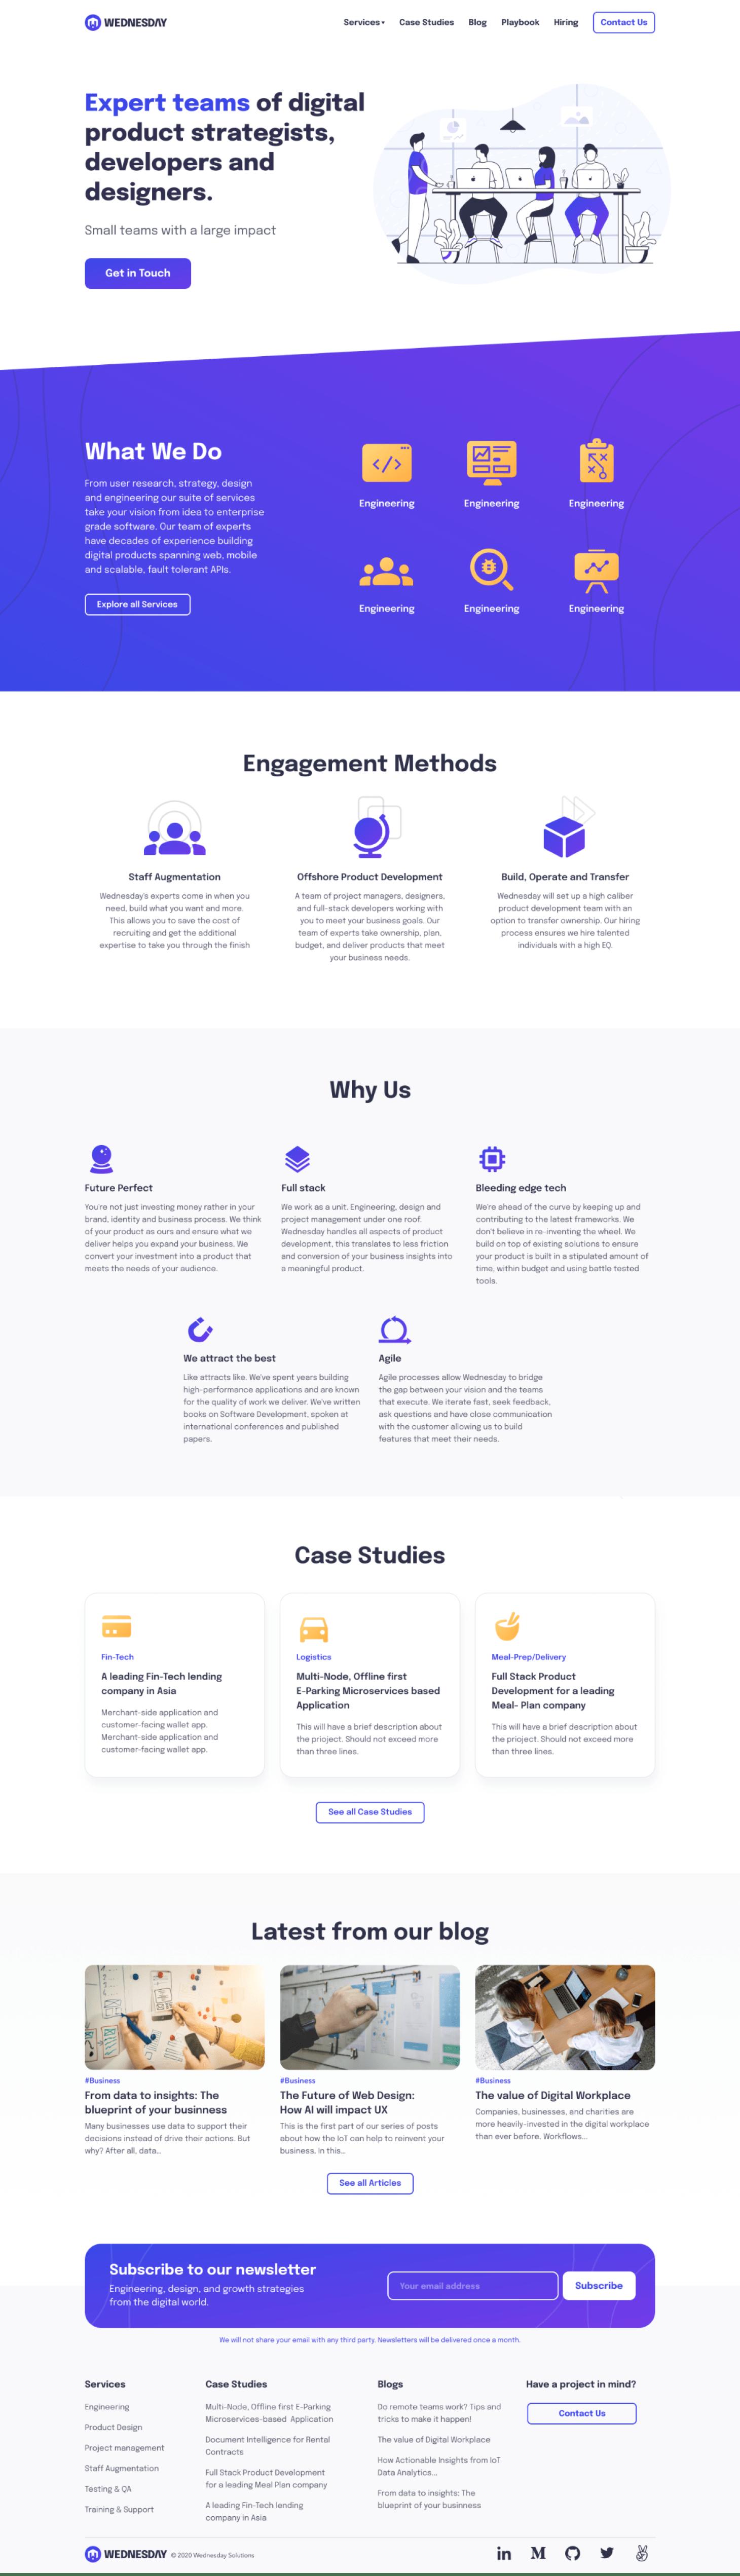 Wednesday Solutions Final Website Design